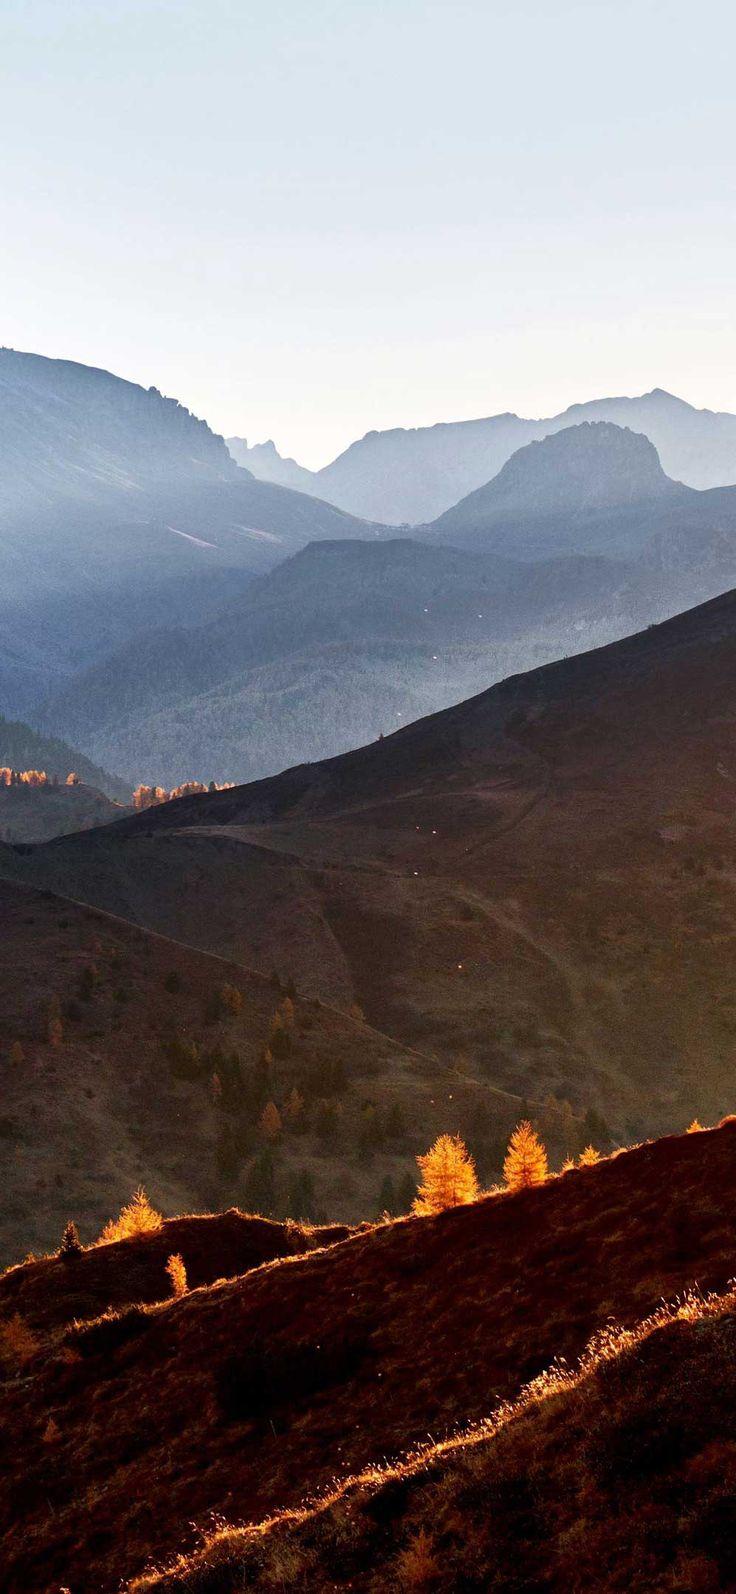 Iphone Pro Wallpaper Giau pass mountain pass fall sunset